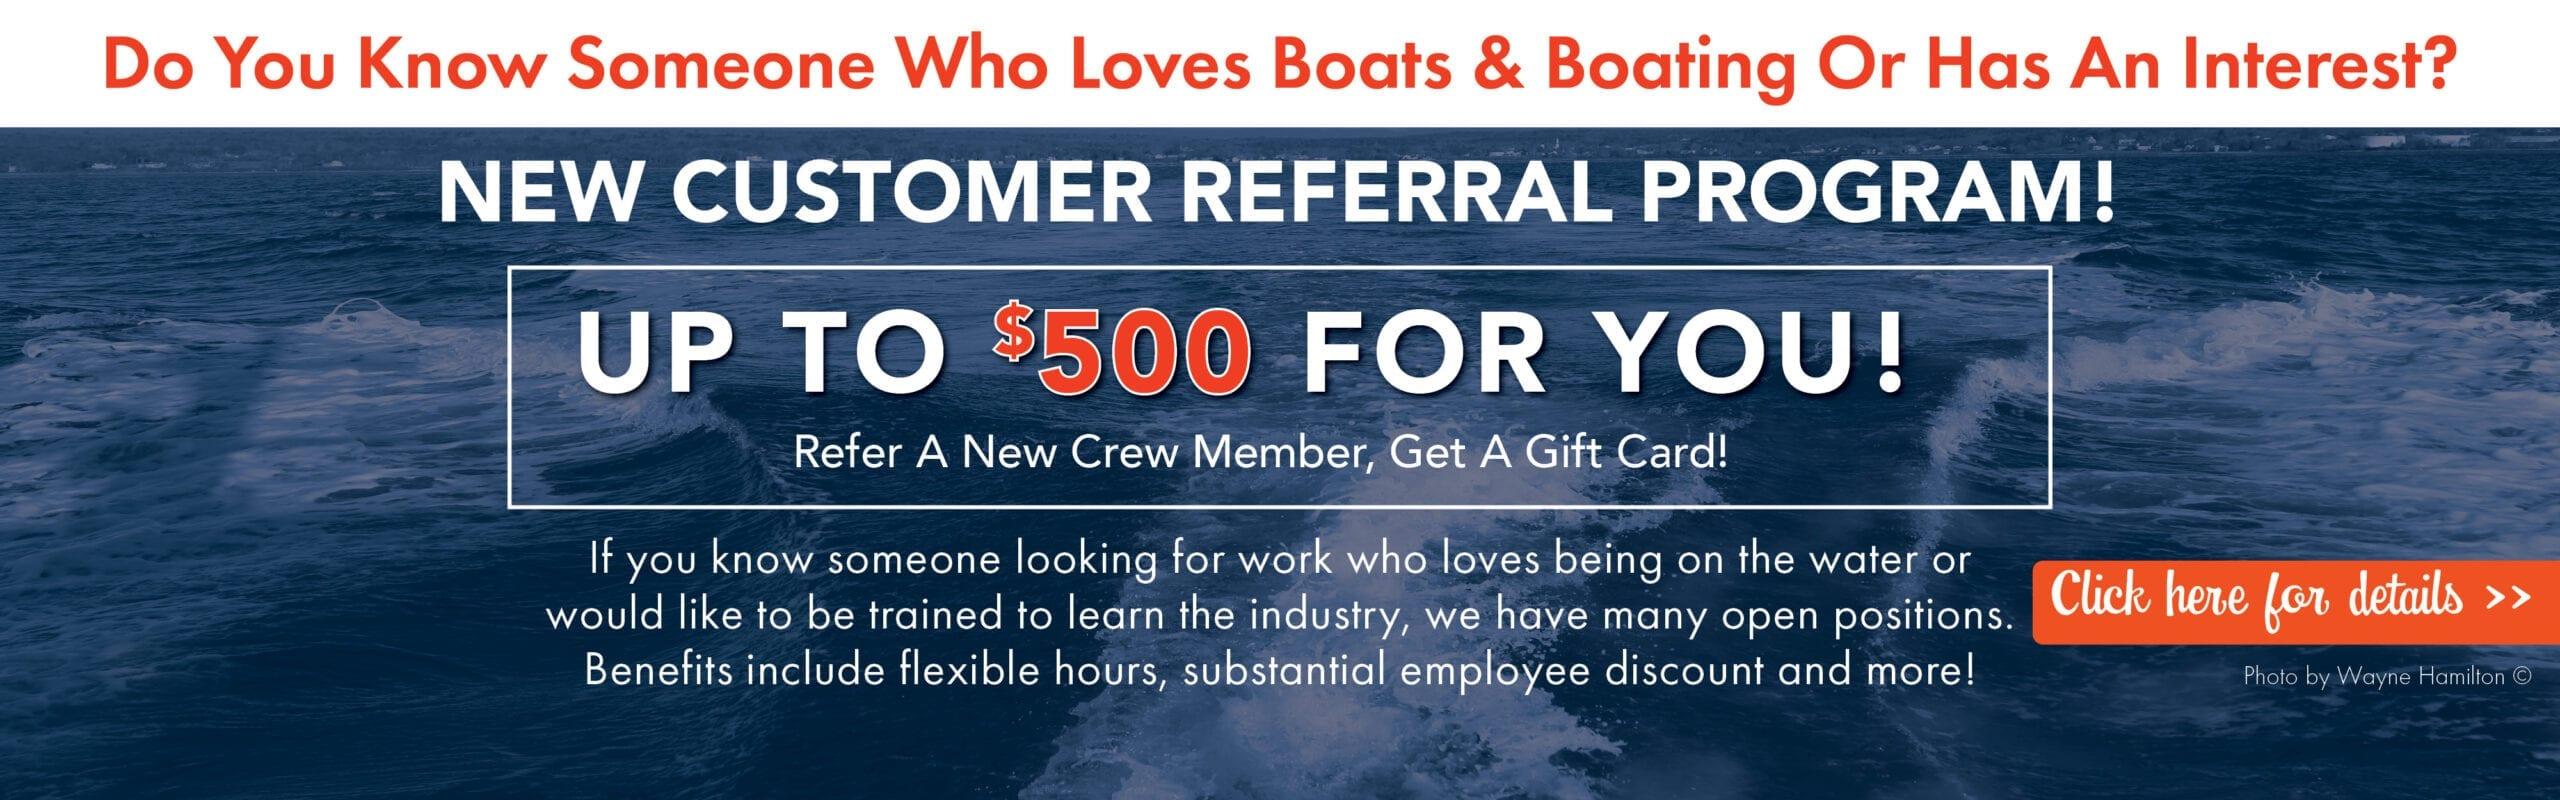 Customer Referral Program